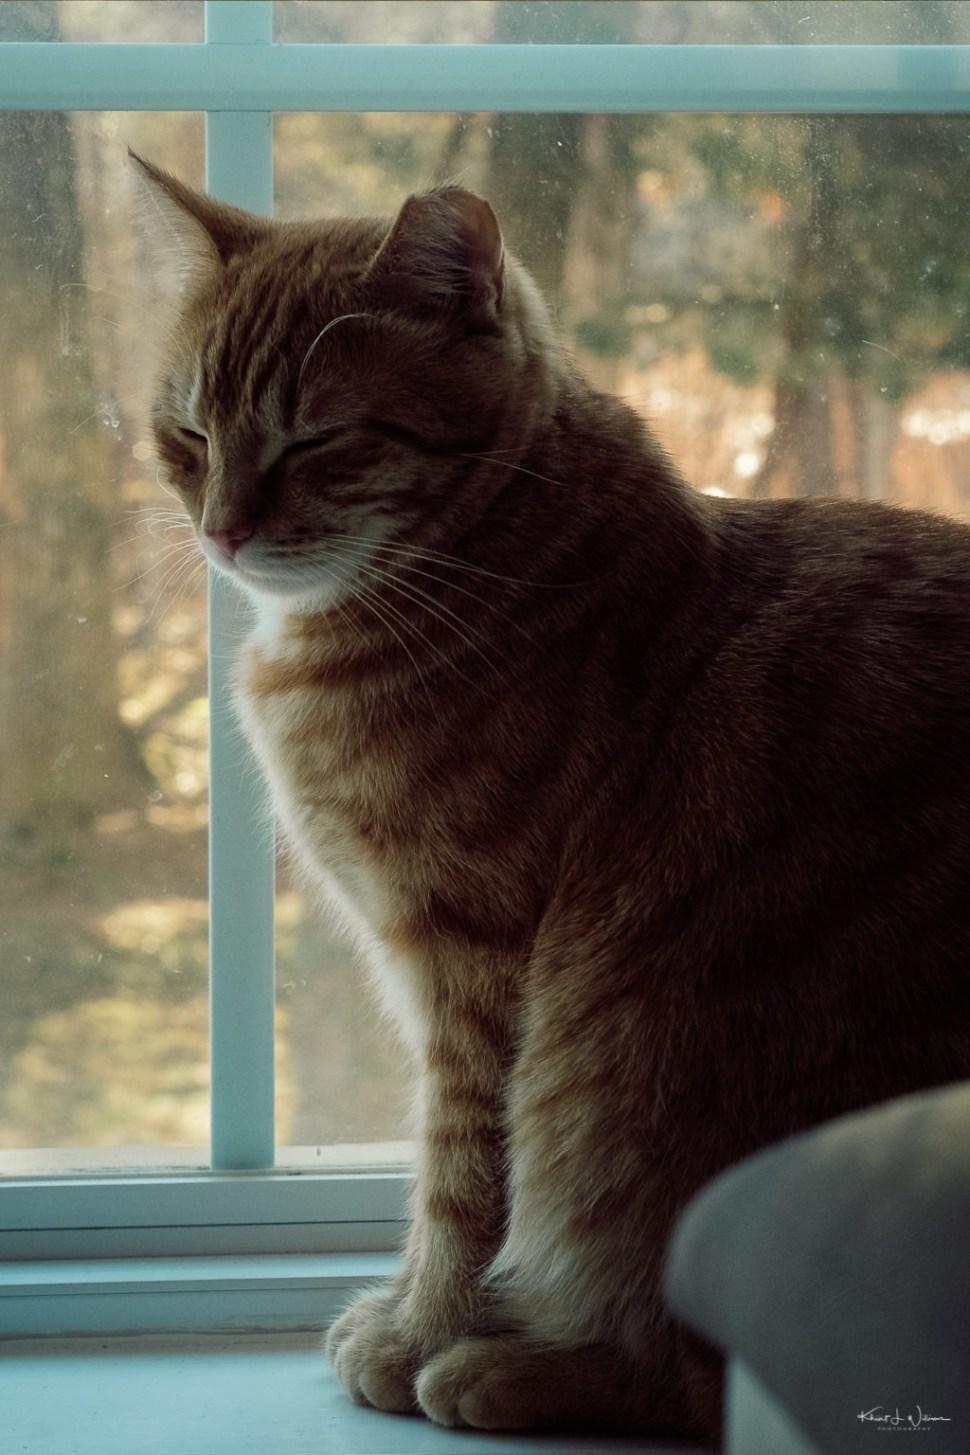 Alphie, Cat on windowsill